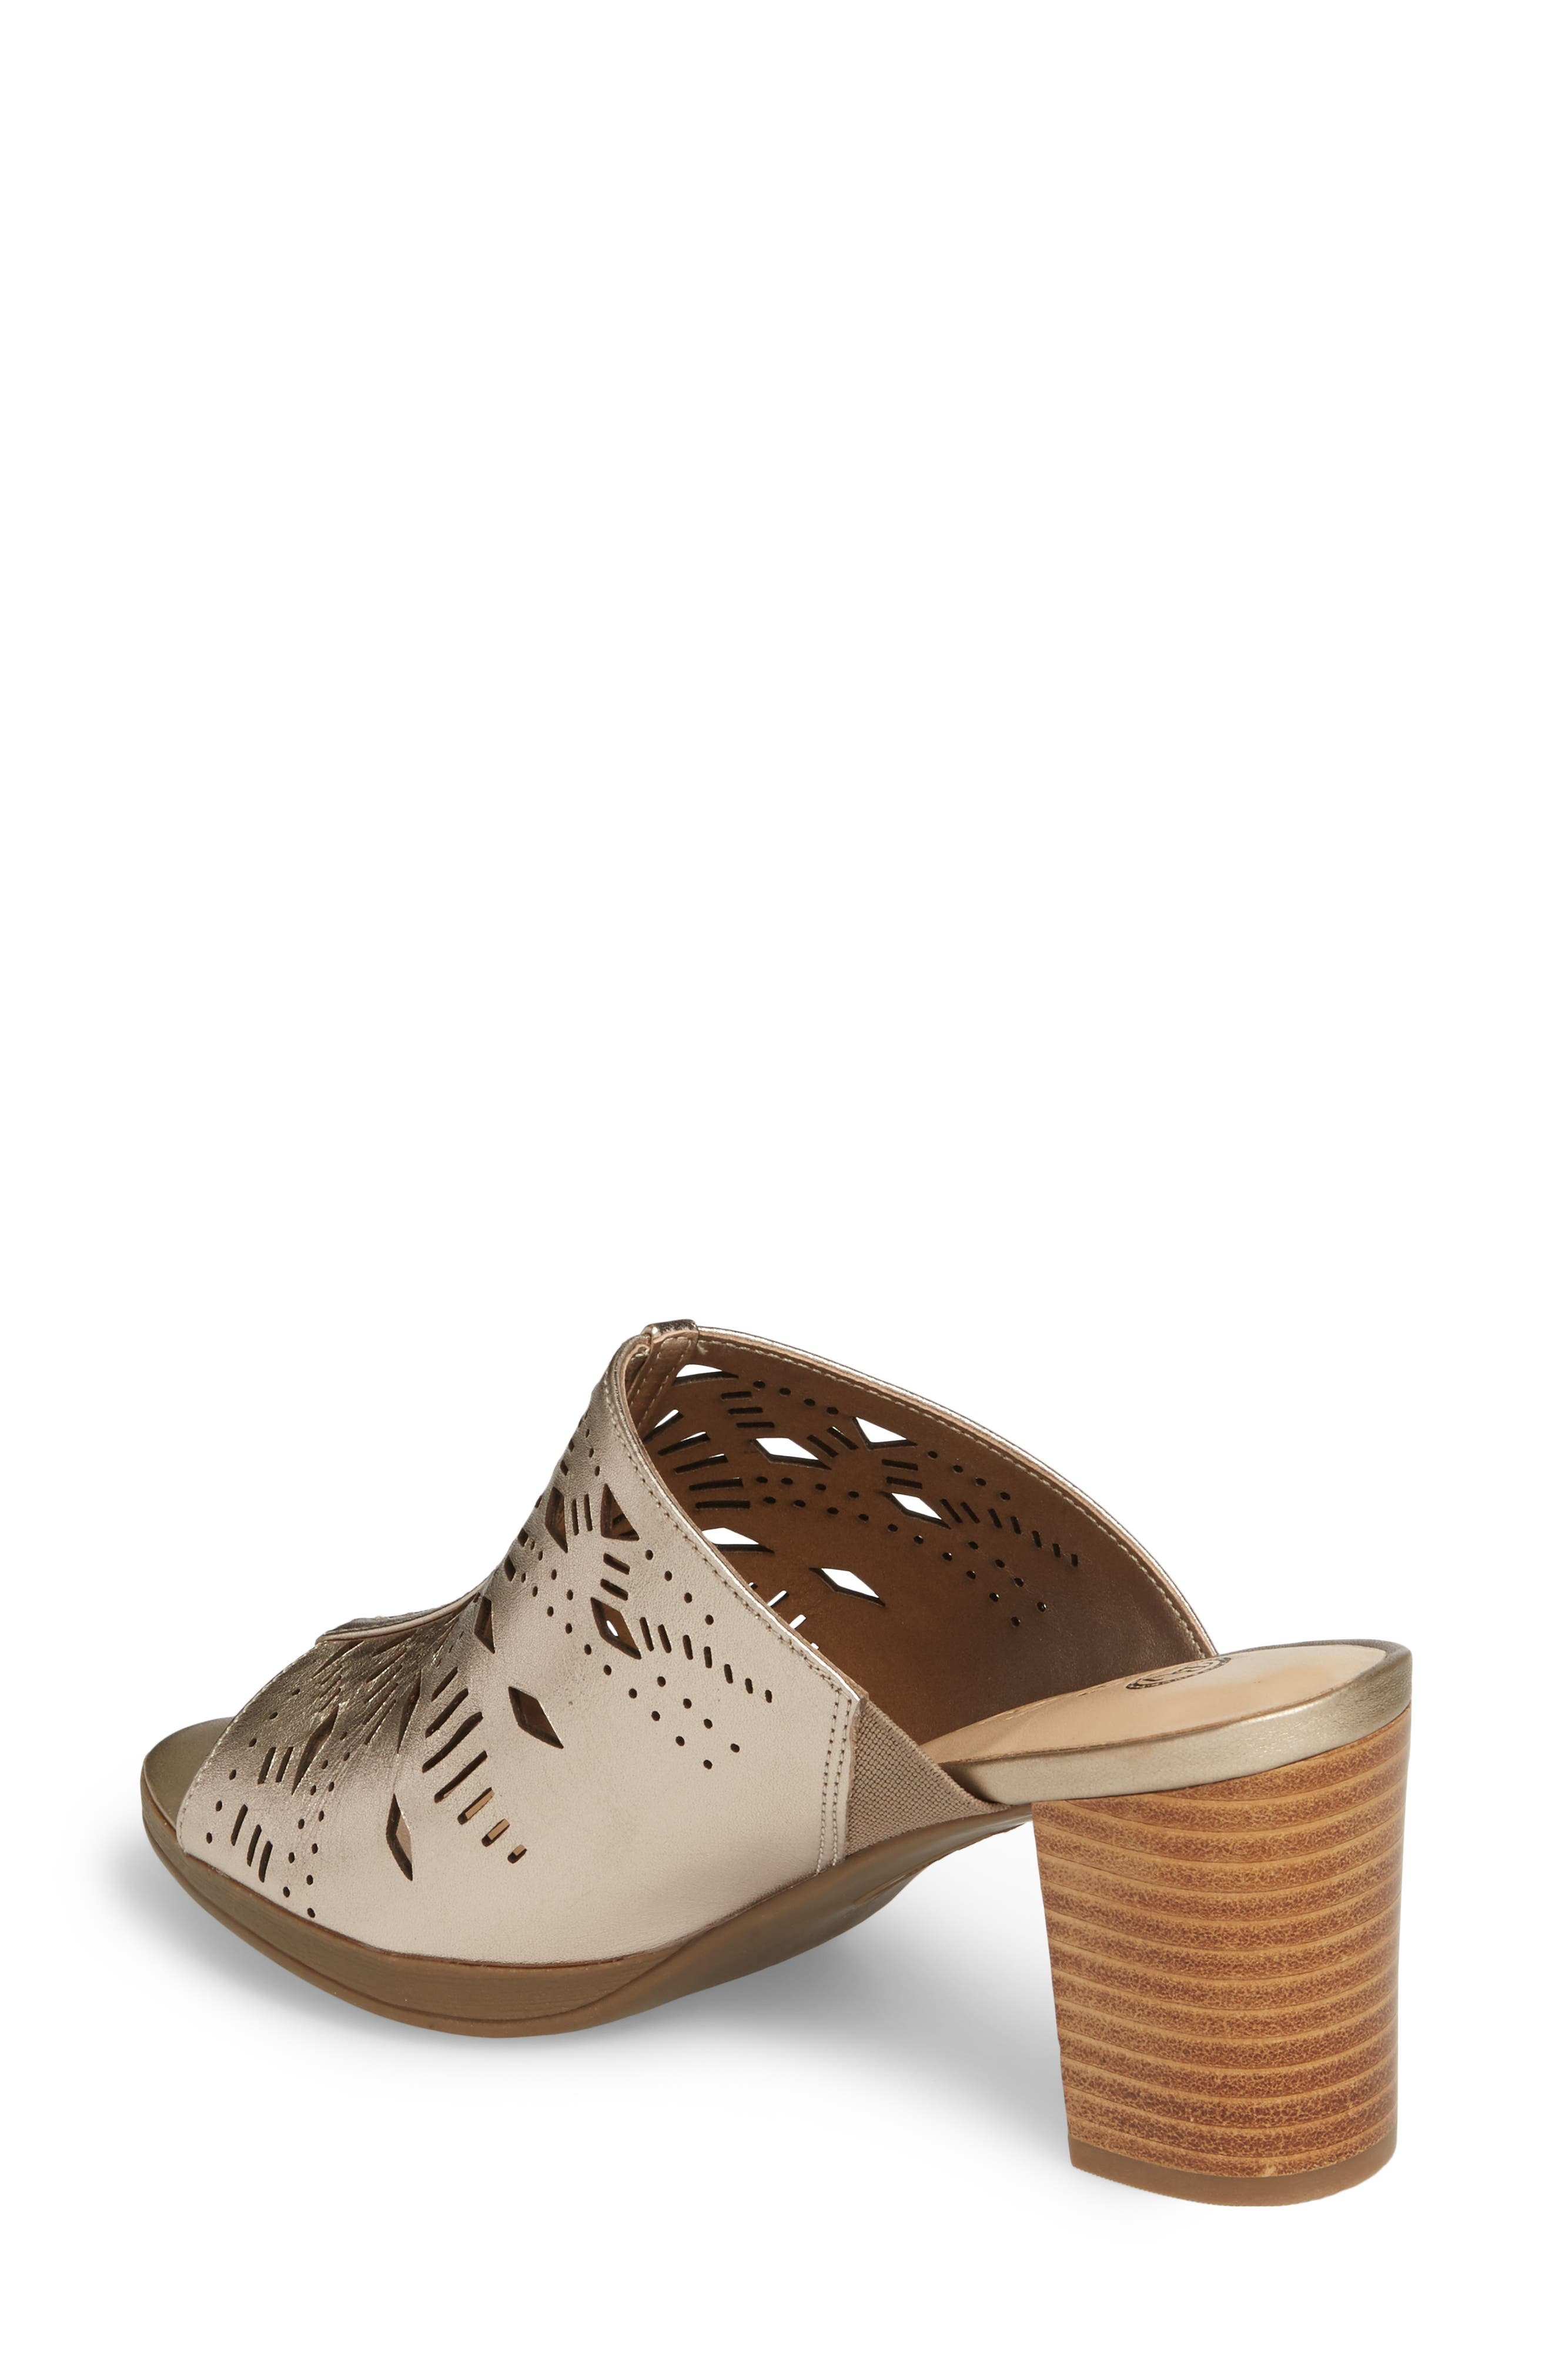 Lark Laser Perforated Slide Sandal,                             Alternate thumbnail 2, color,                             Champagne Leather